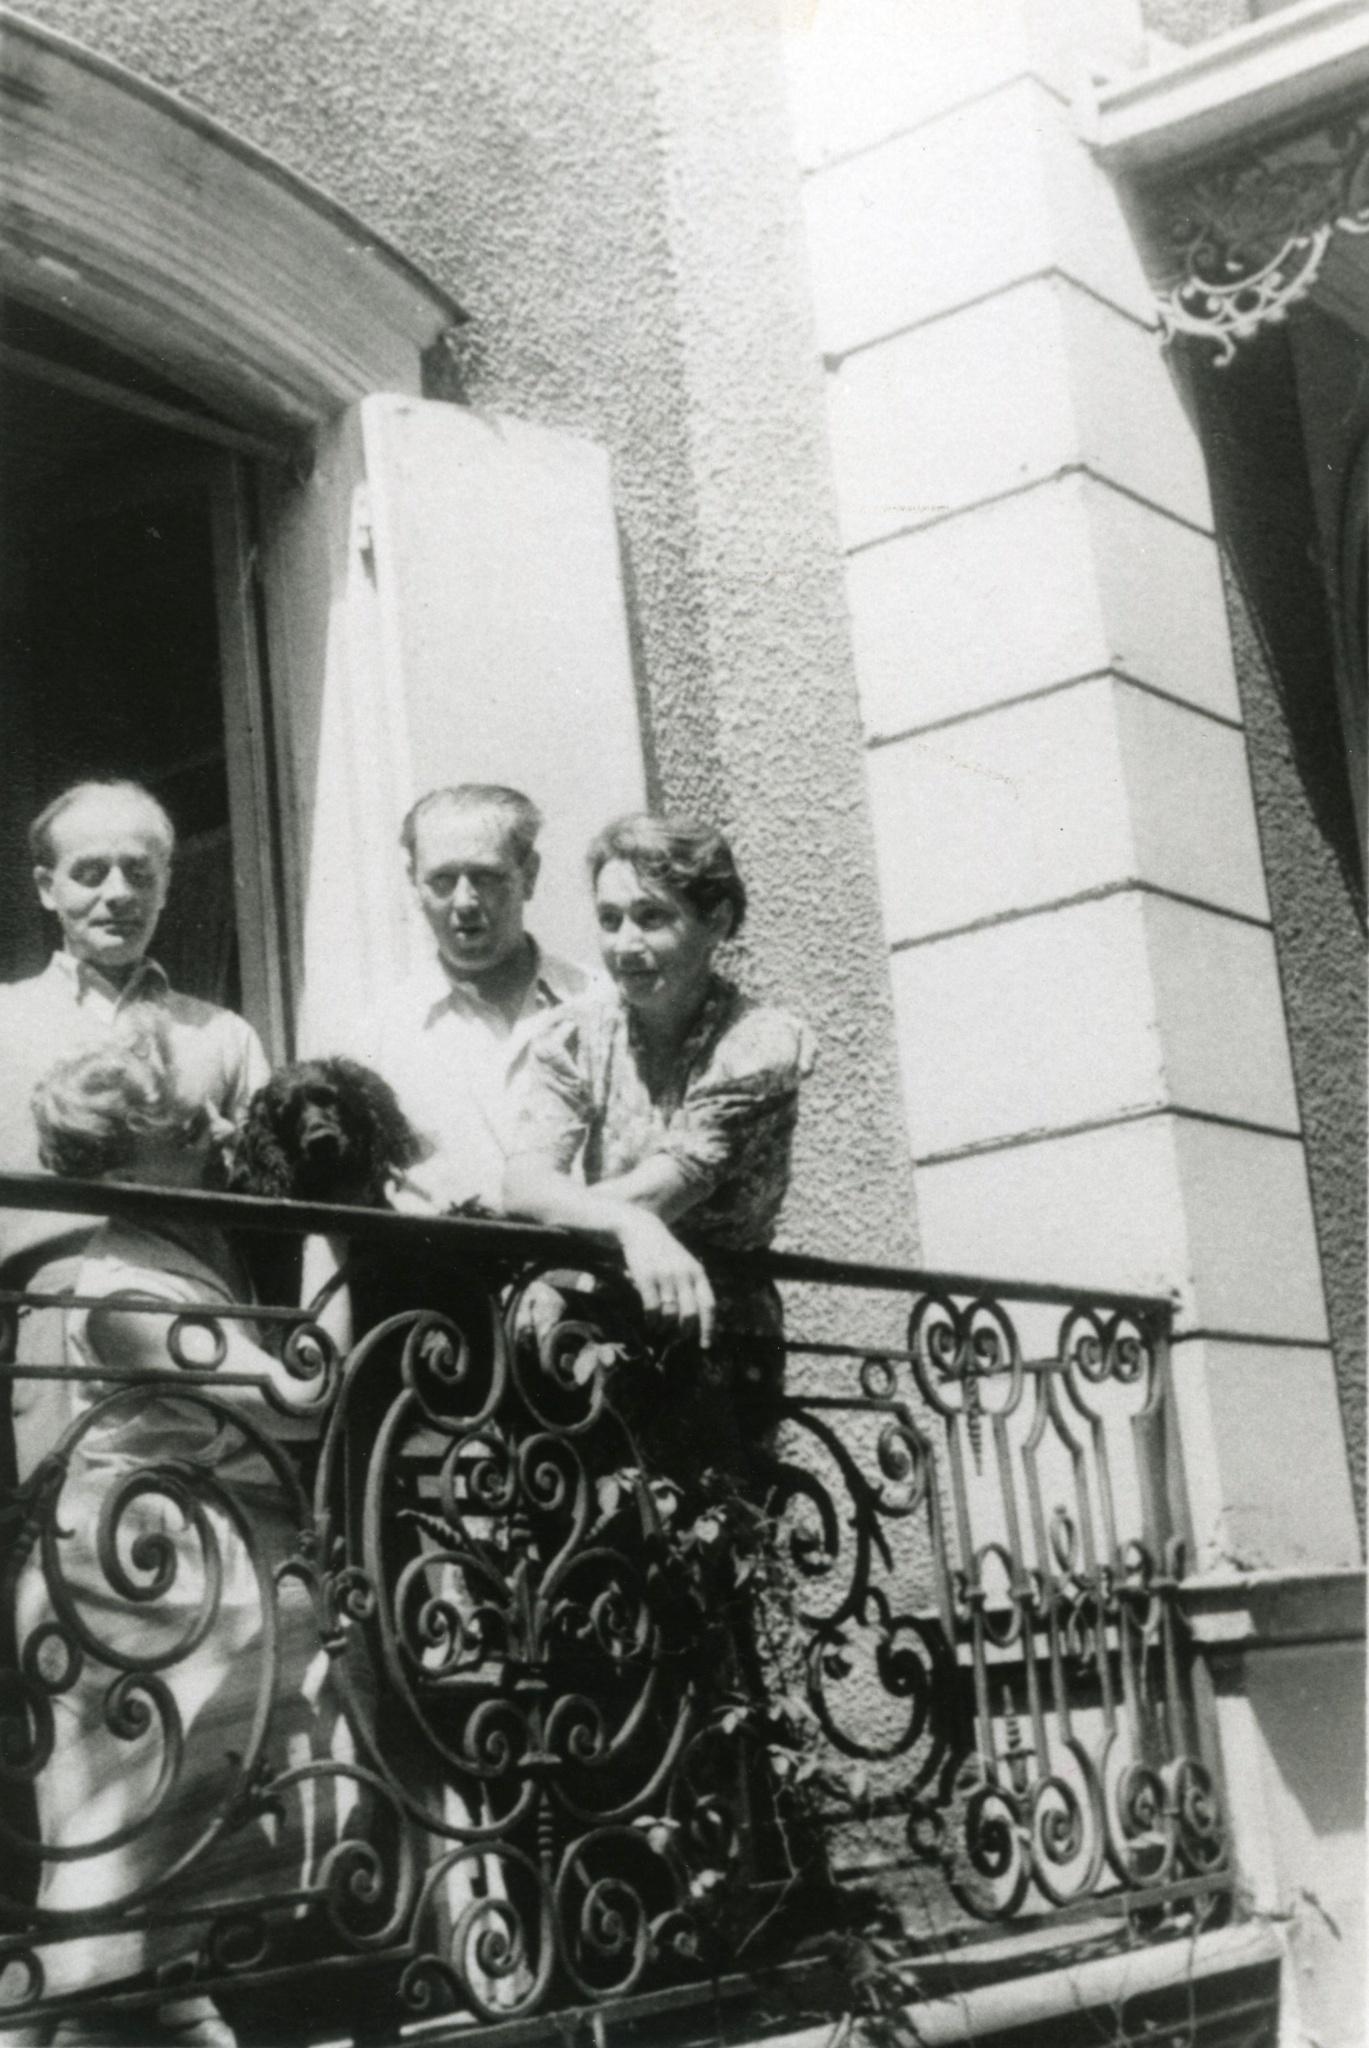 <div class='inner-box'><div class='close-desc'></div><span class='opis'>Jerzy Giedroyc, Maria Czapska (siedzi), Zygmunt Hertz i Zofia Hertz. Na balkonie domu przy av.Corneille. Maisons-Laffitte 1952 r.</span><div class='clearfix'></div><span>Sygn. FIL00295</span><div class='clearfix'></div><span class='autor'>fot. Henryk Giedroyc</span><div class='clearfix'></div><span>&copy;Henryk Giedroyc</span></div>